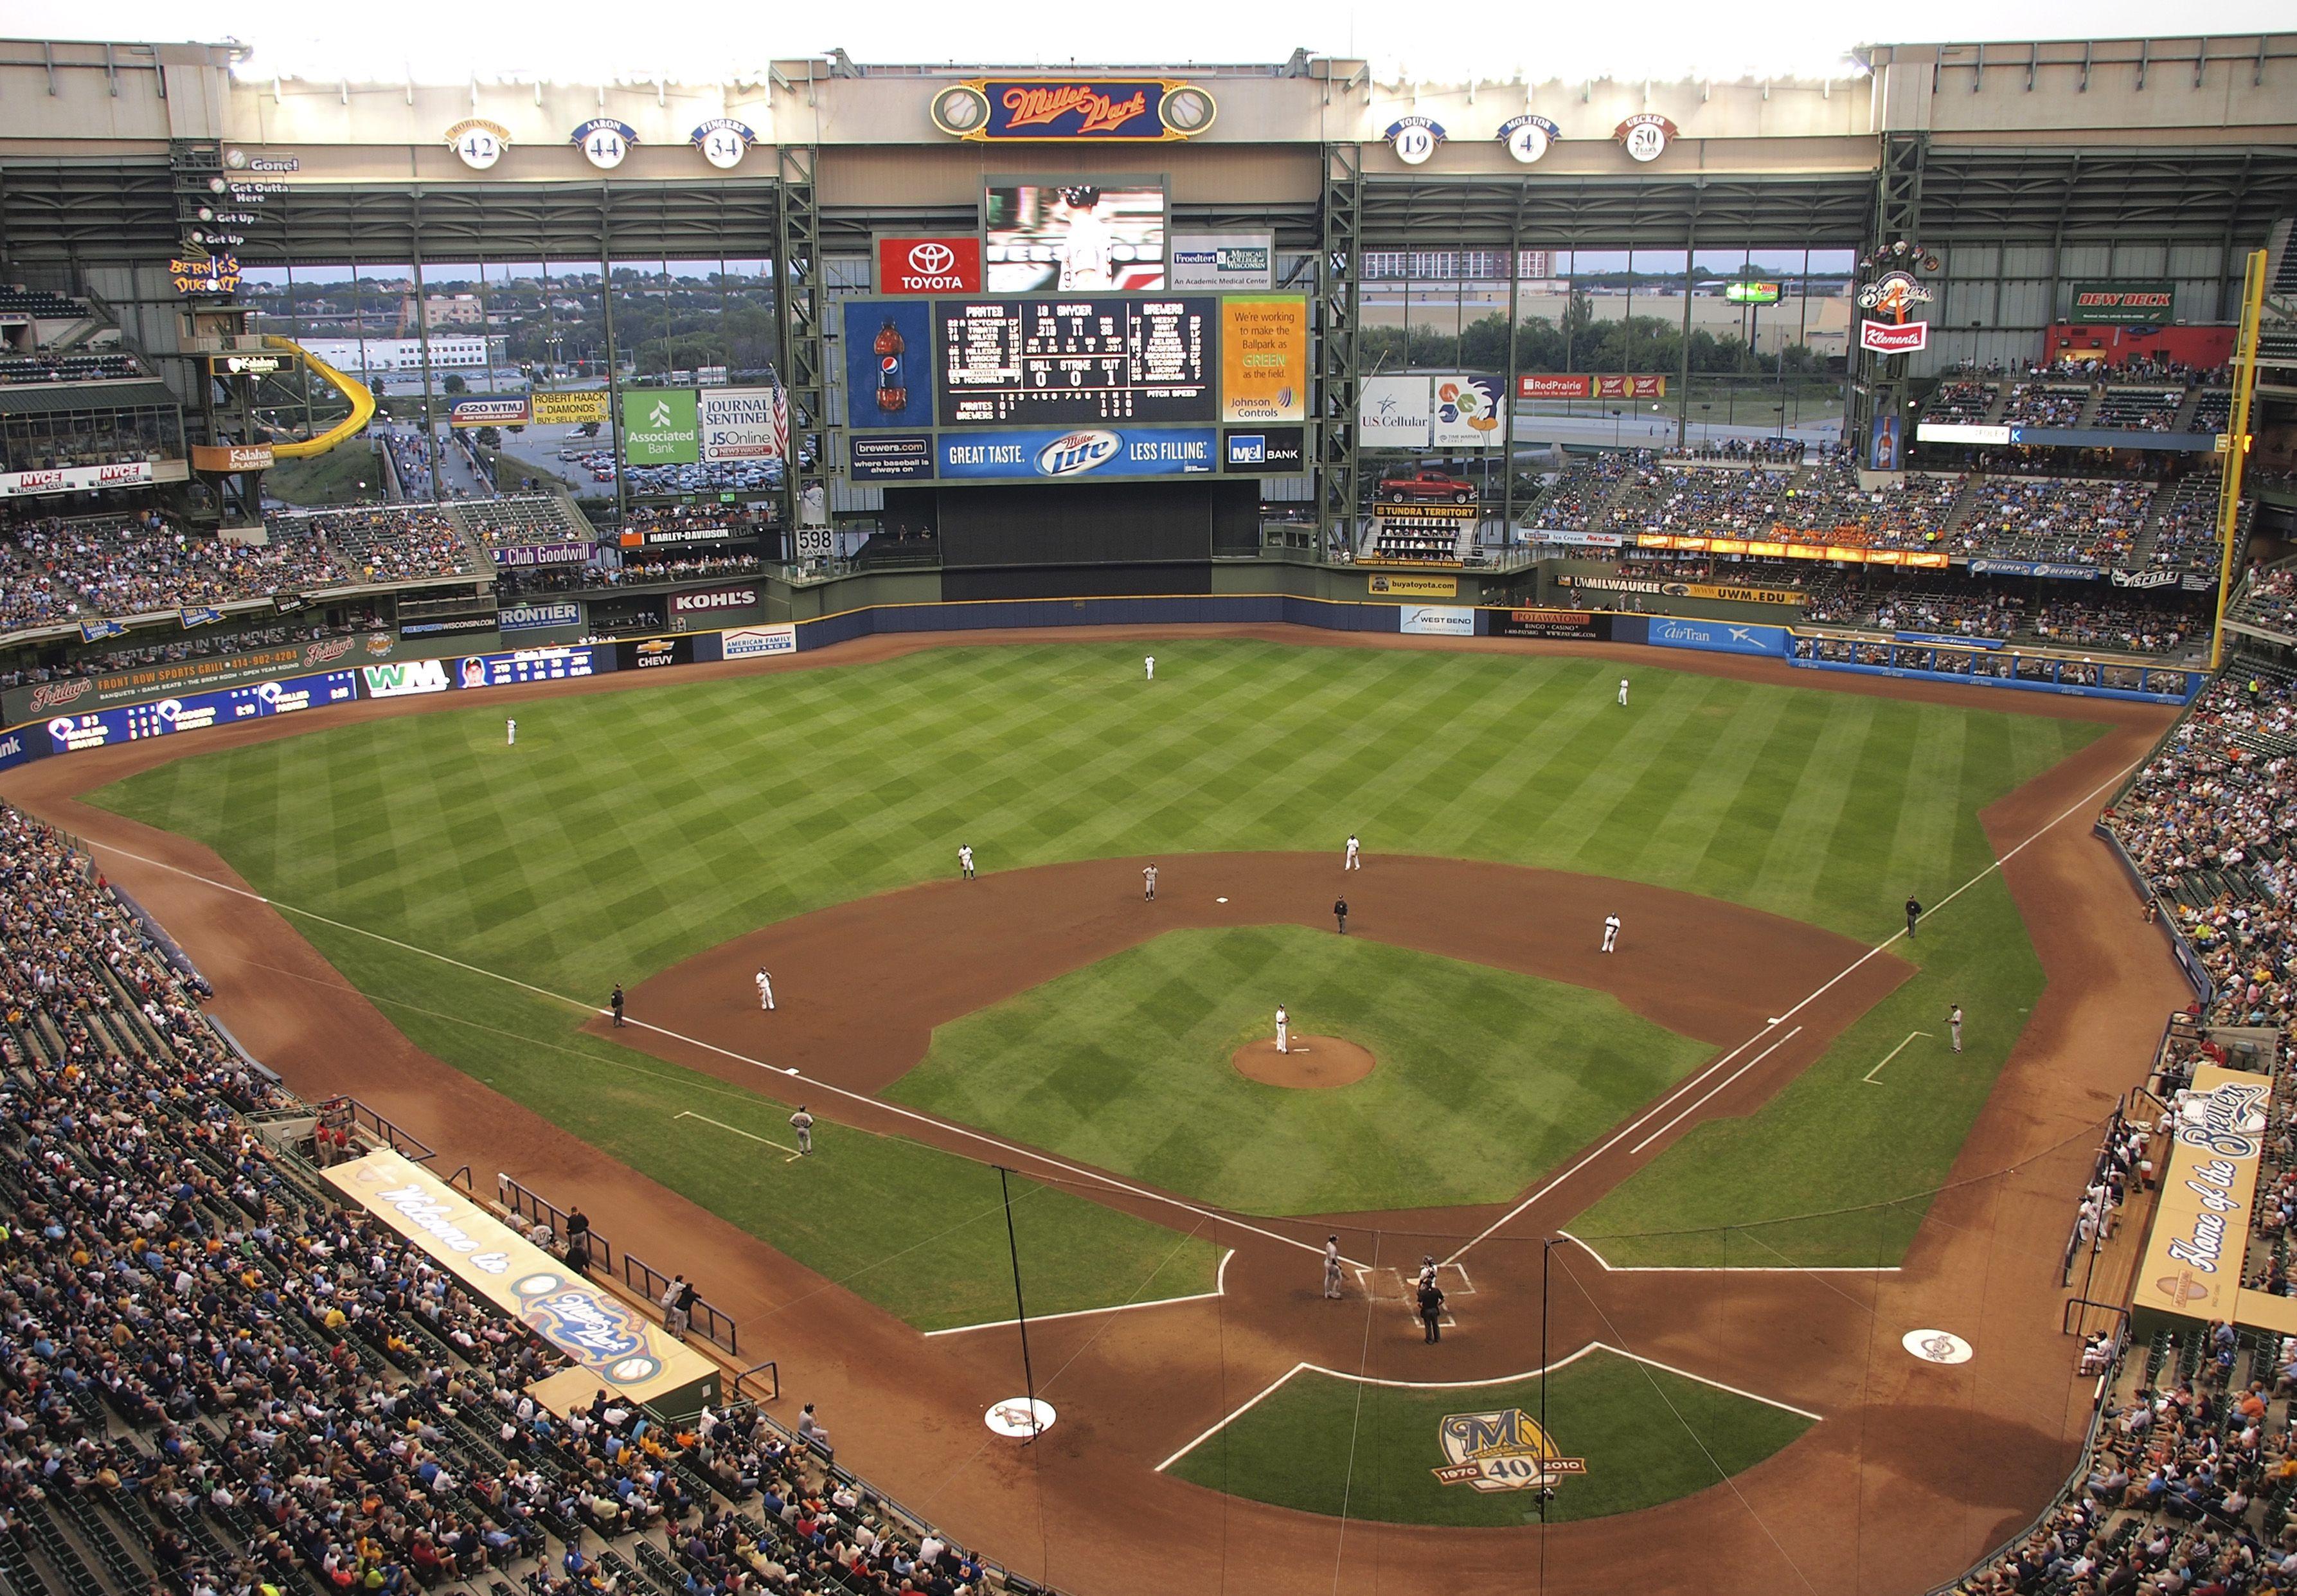 Milwaukee Brewers Bedroom In A Box Major League Baseball: Miller Park Milwaukee, Wisconsin